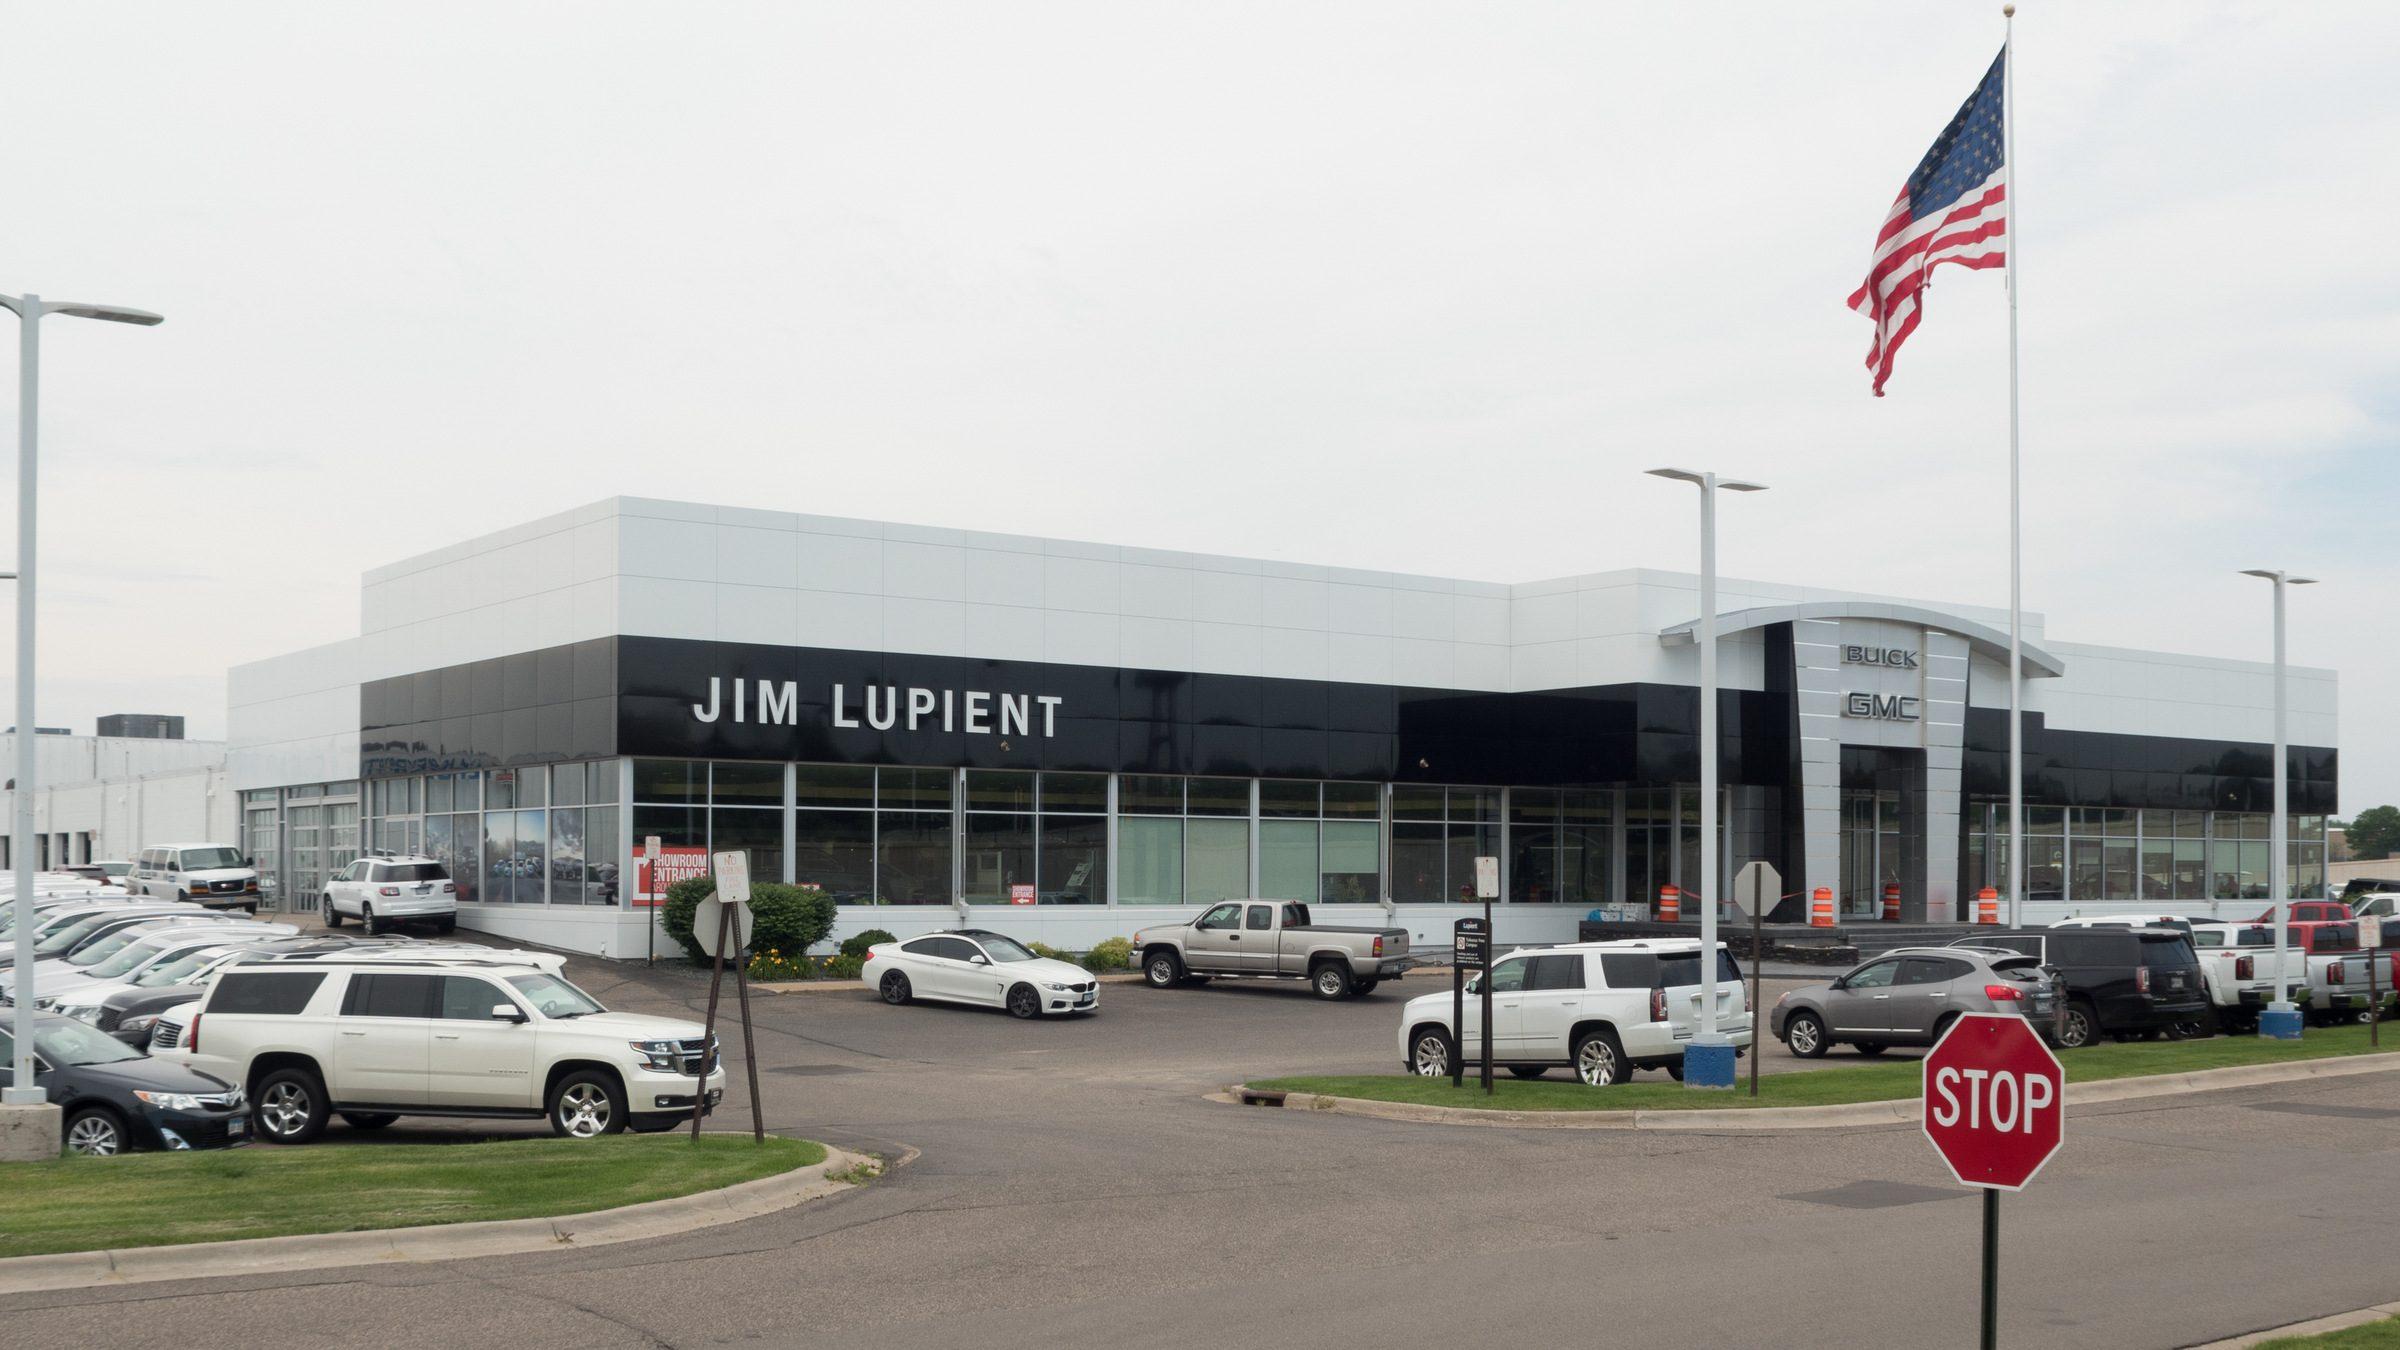 Jim Lupient Buick GMC